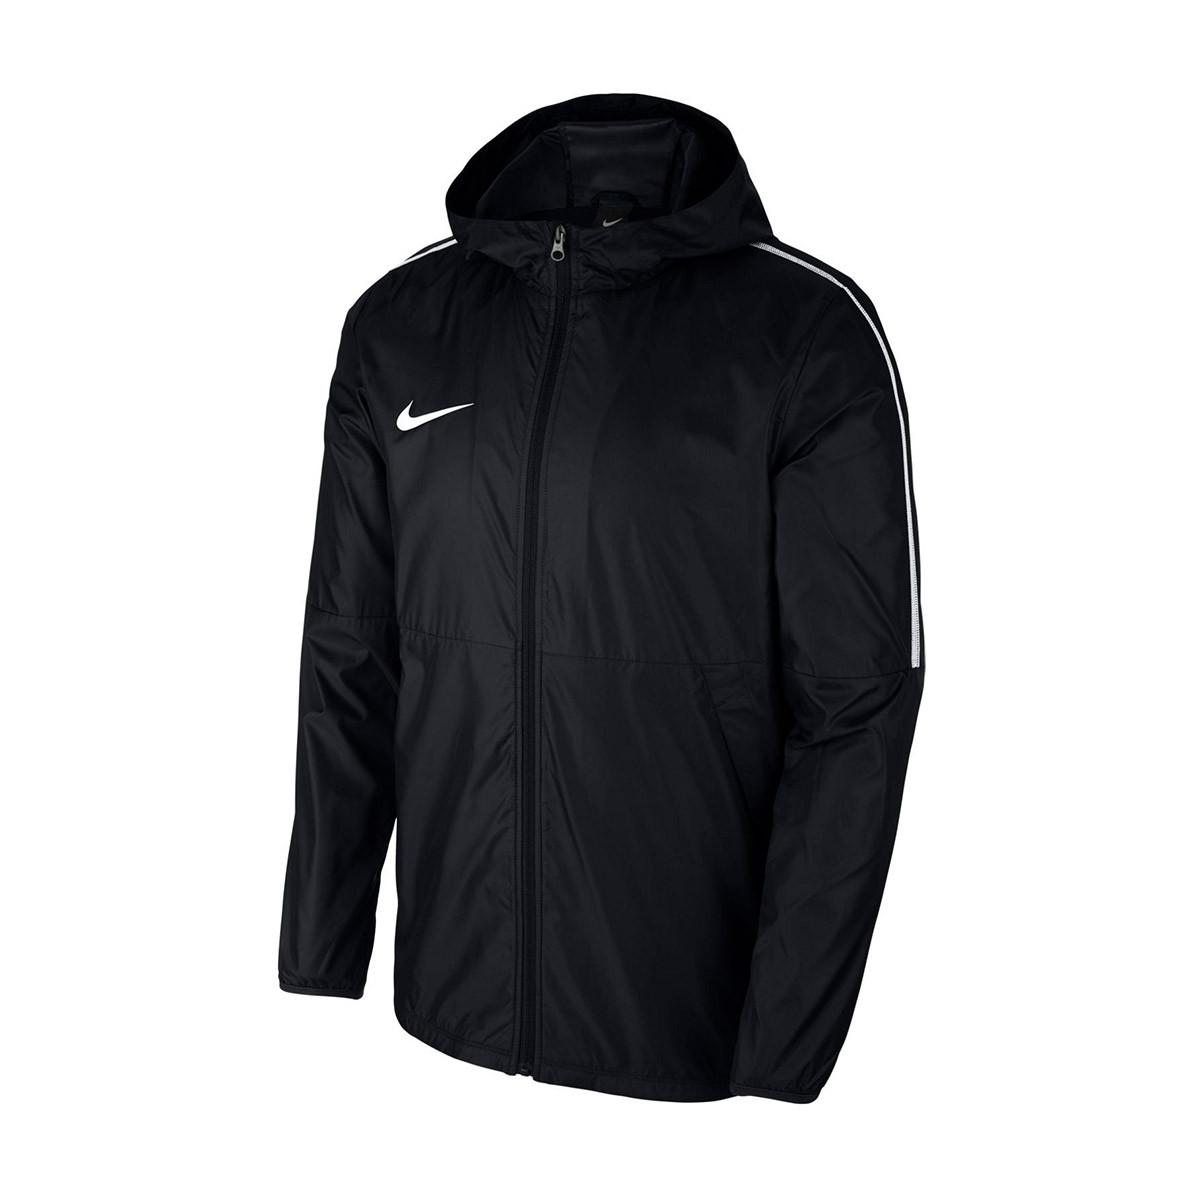 Guerrero lluvia Ceniza  Chubasquero Nike Park 18 Black-White - Tienda de fútbol Fútbol Emotion